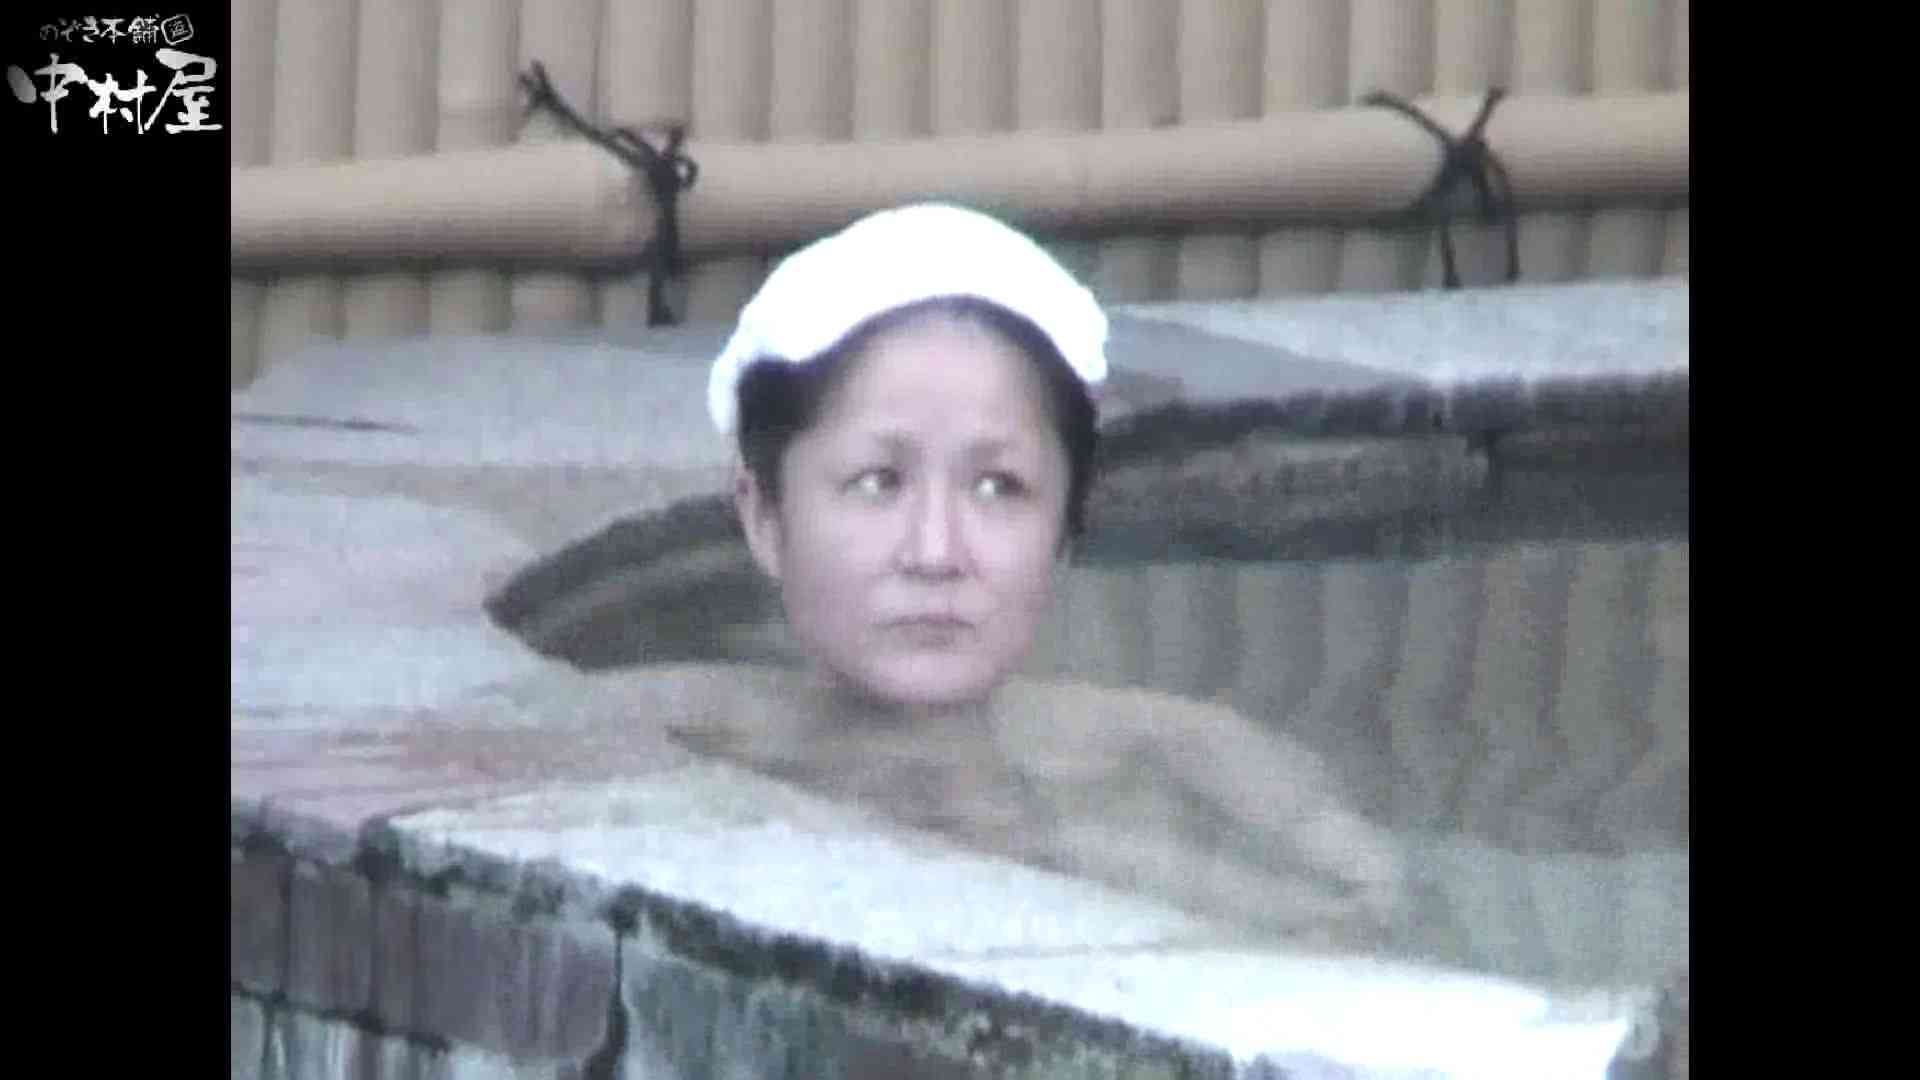 Aquaな露天風呂Vol.880潜入盗撮露天風呂十六判湯 其の六 露天 | 潜入シリーズ  95pic 71